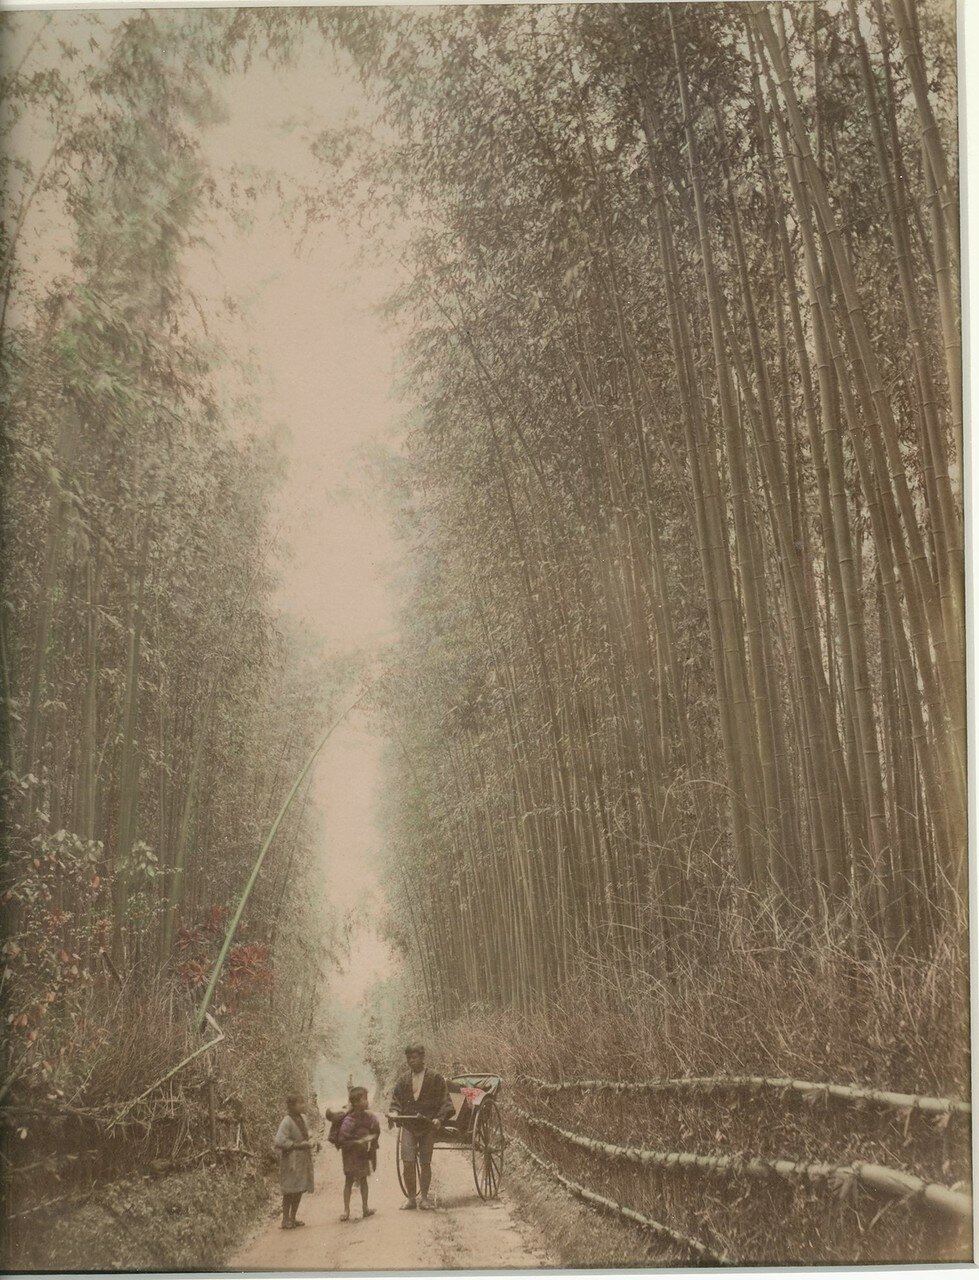 Киото. Бамбуковая роща